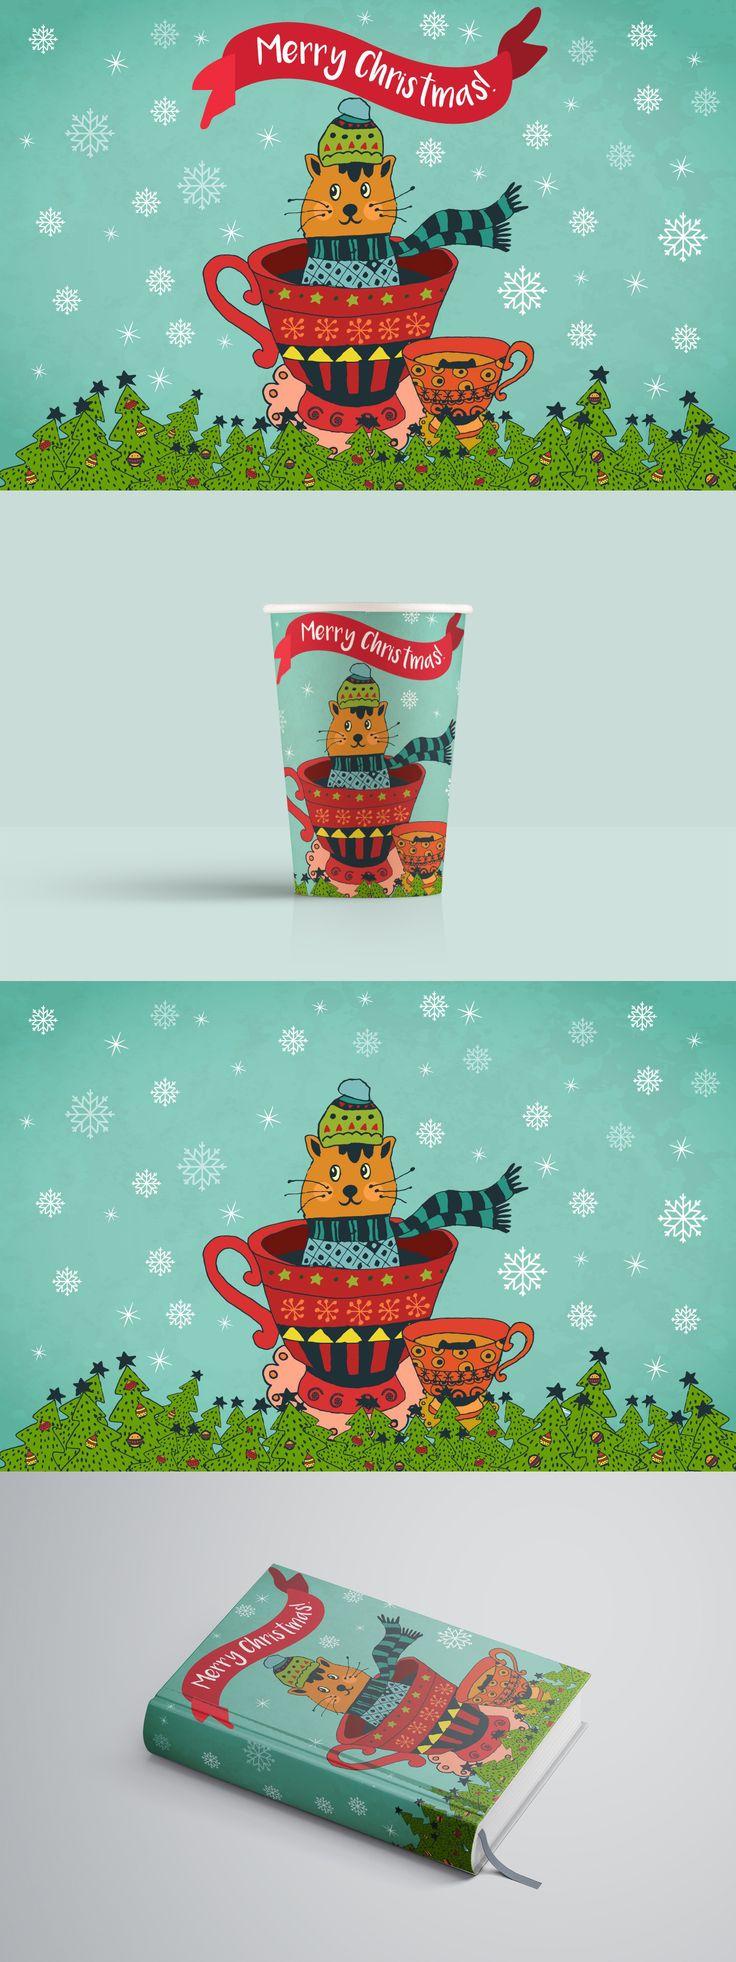 Merry Christmas Free Illustration Art Free